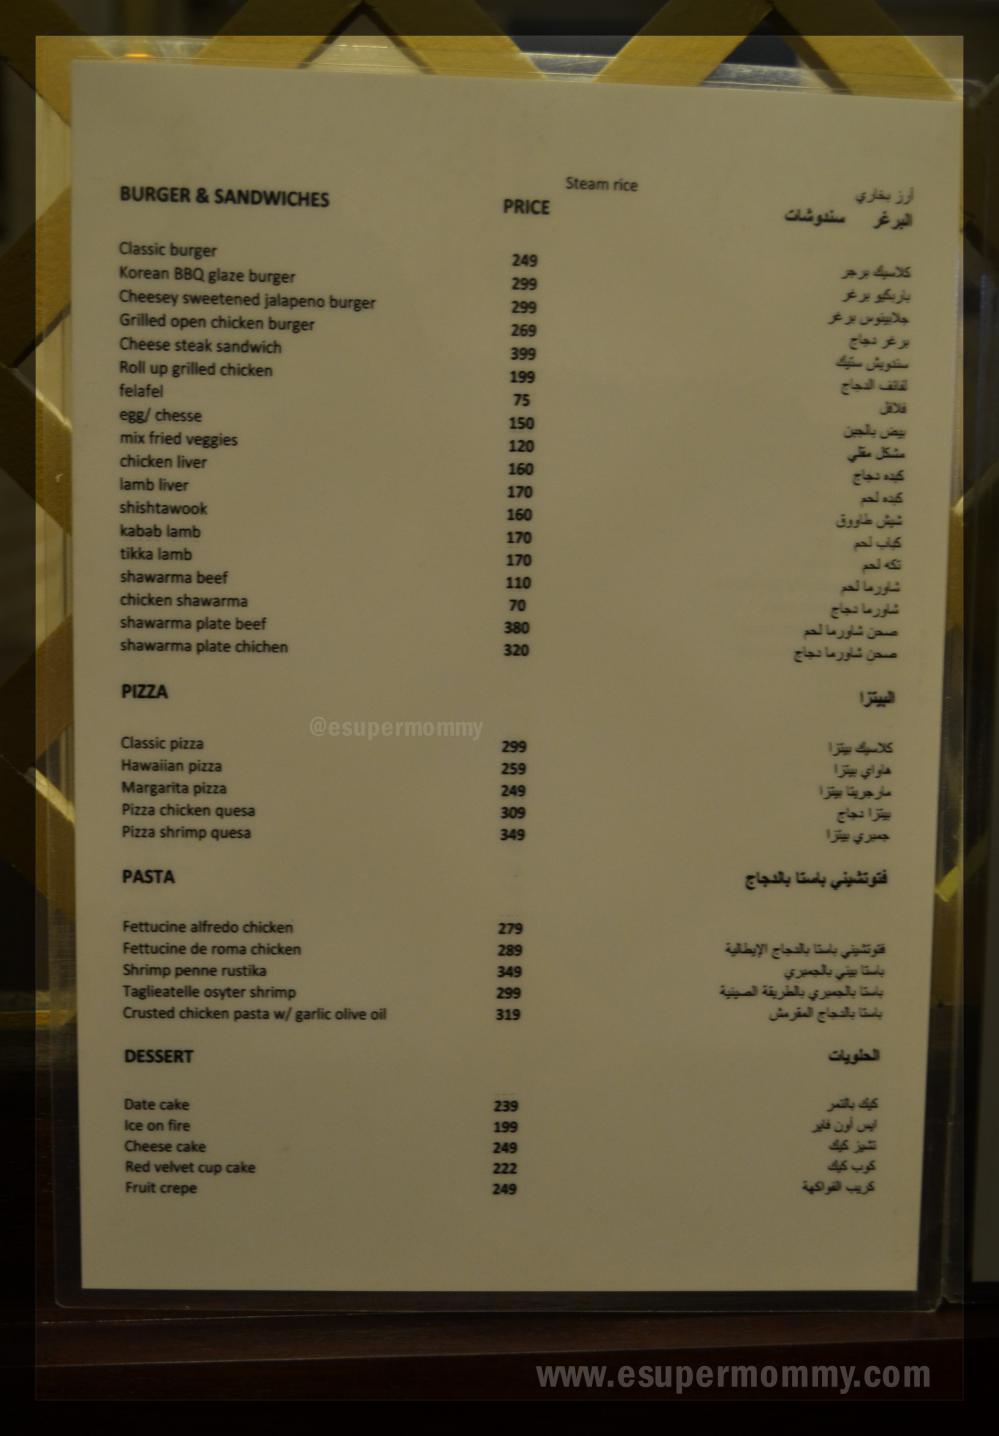 Al-Qaysar Restaurant and Cafe price list